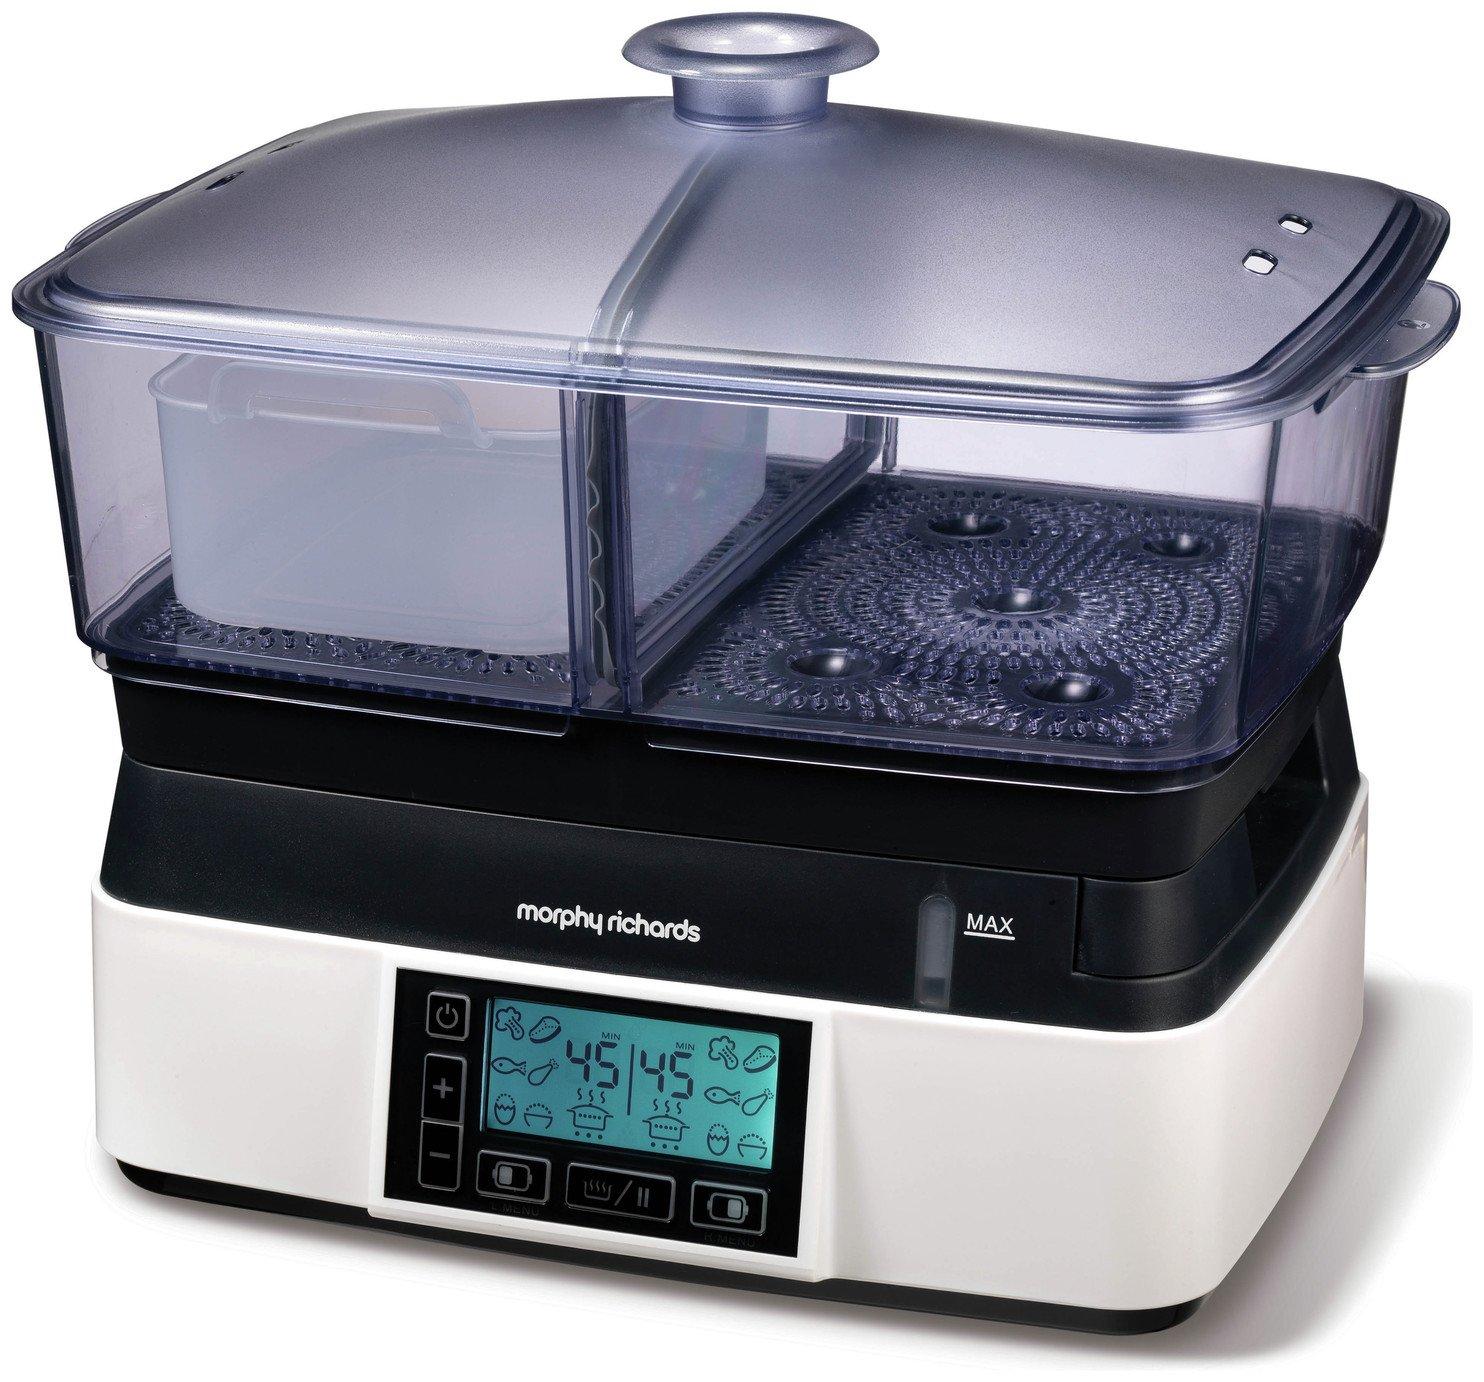 Morphy Richards 48775 Intellisteam Compact Food Steamer 6L